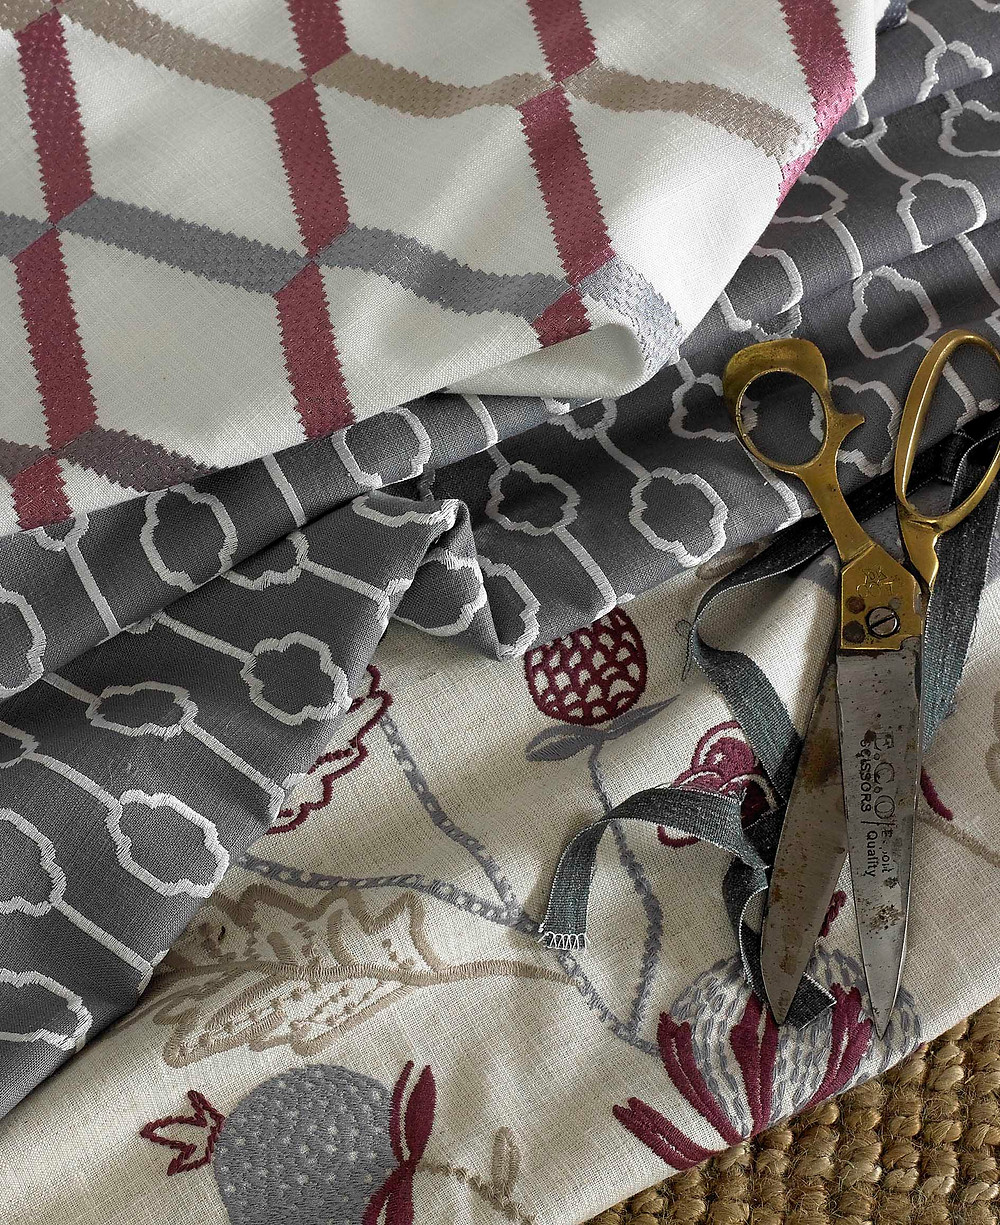 Curtain and sofa fabrics